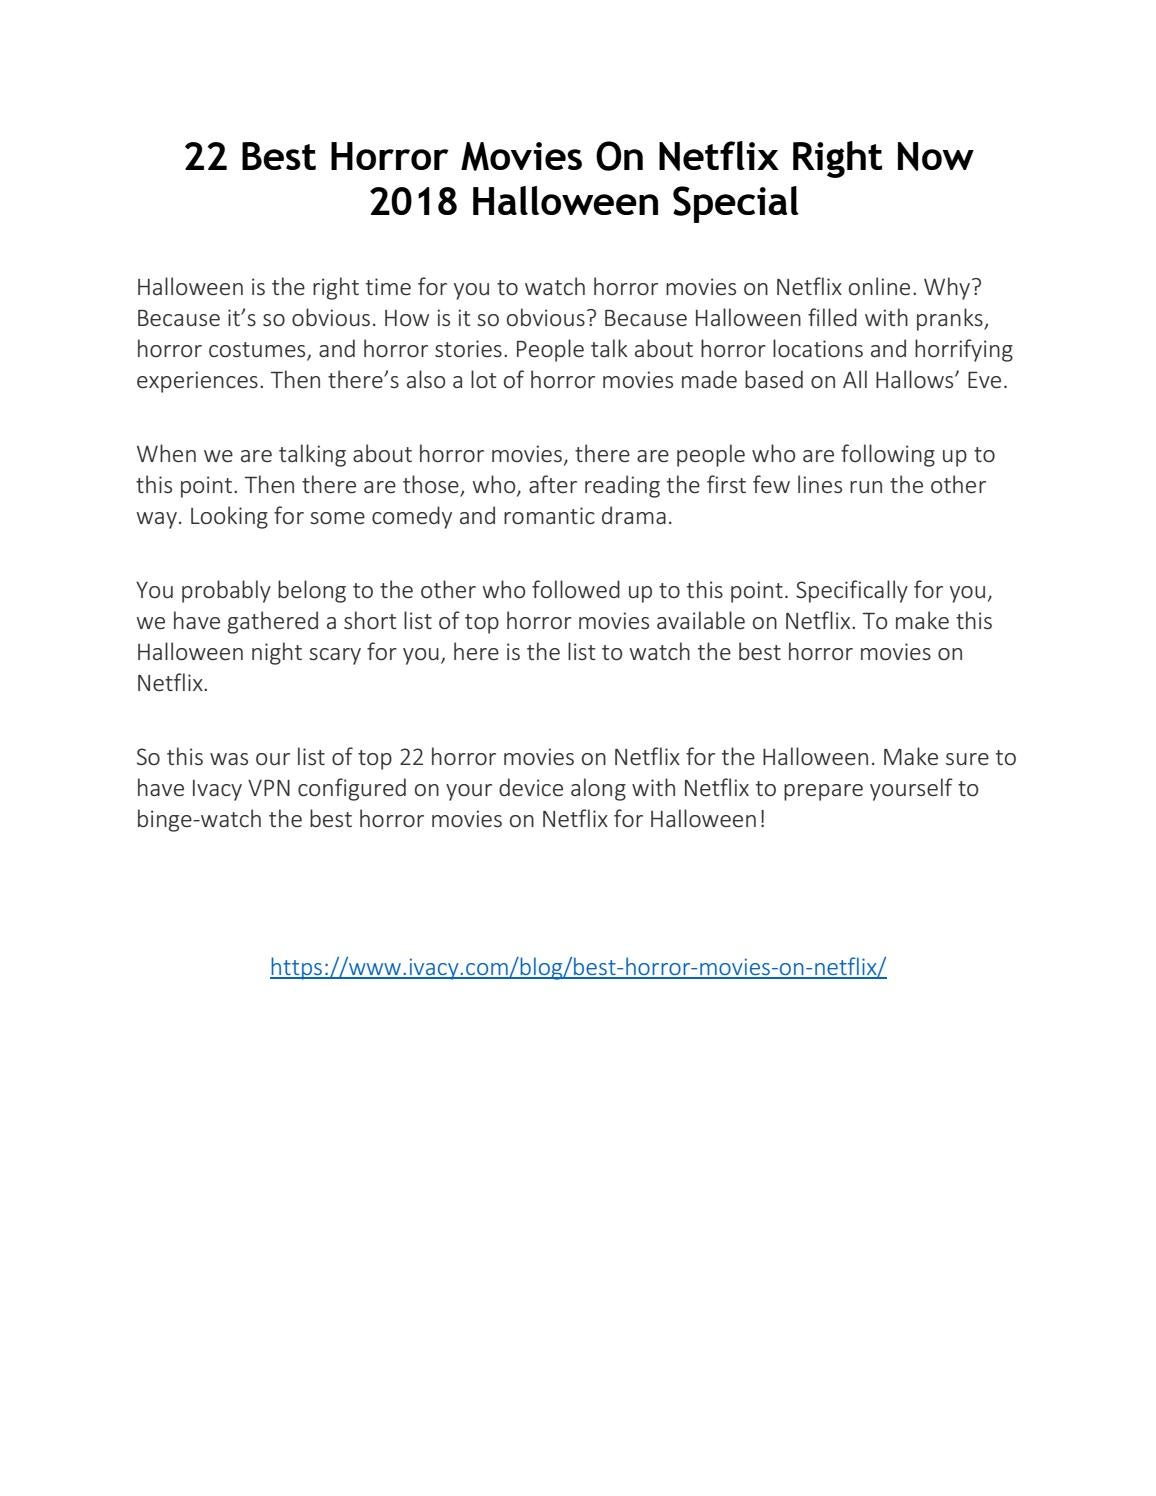 22 Best Horror Movies On Netflix Right Now – 2018 Halloween